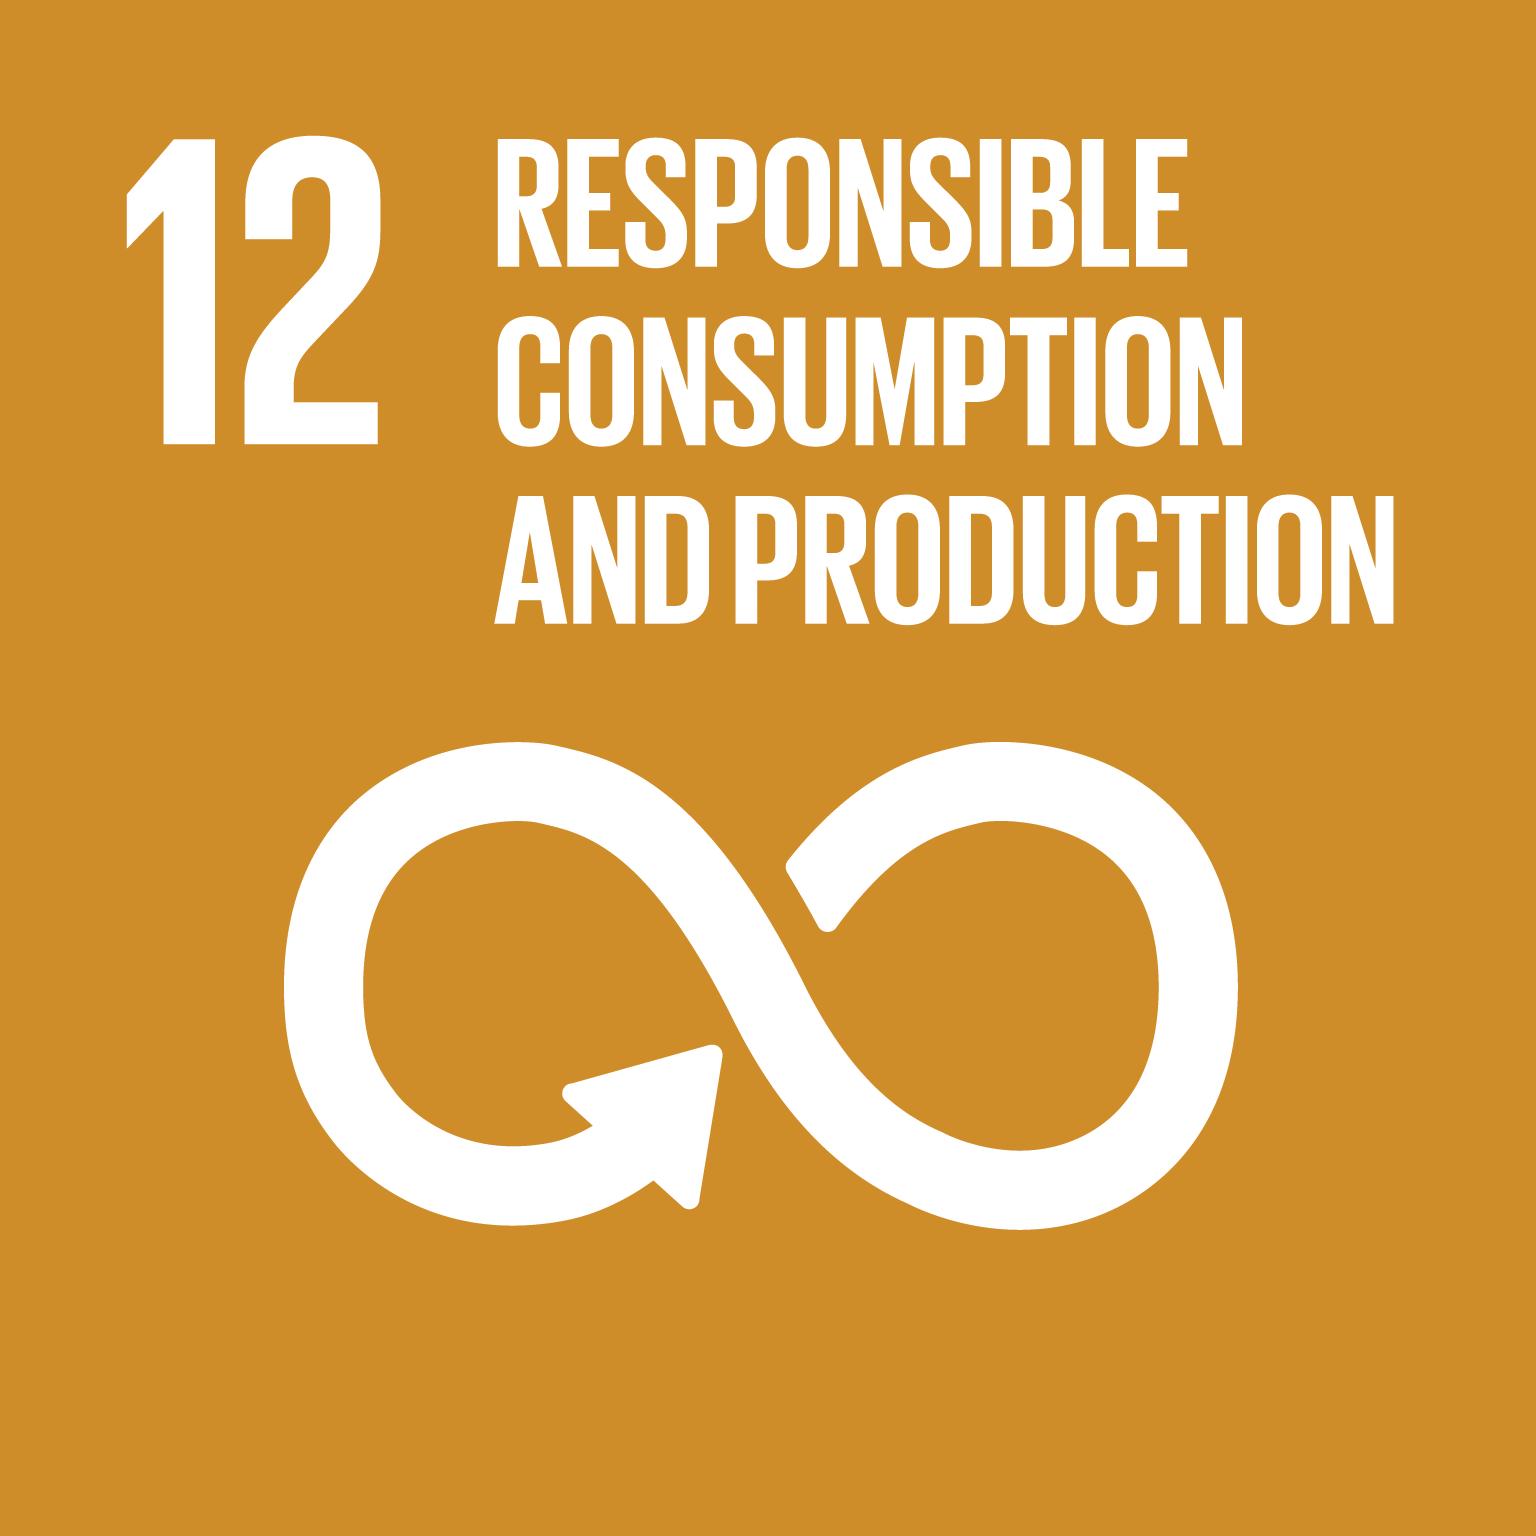 12 responsible consumption, production.png